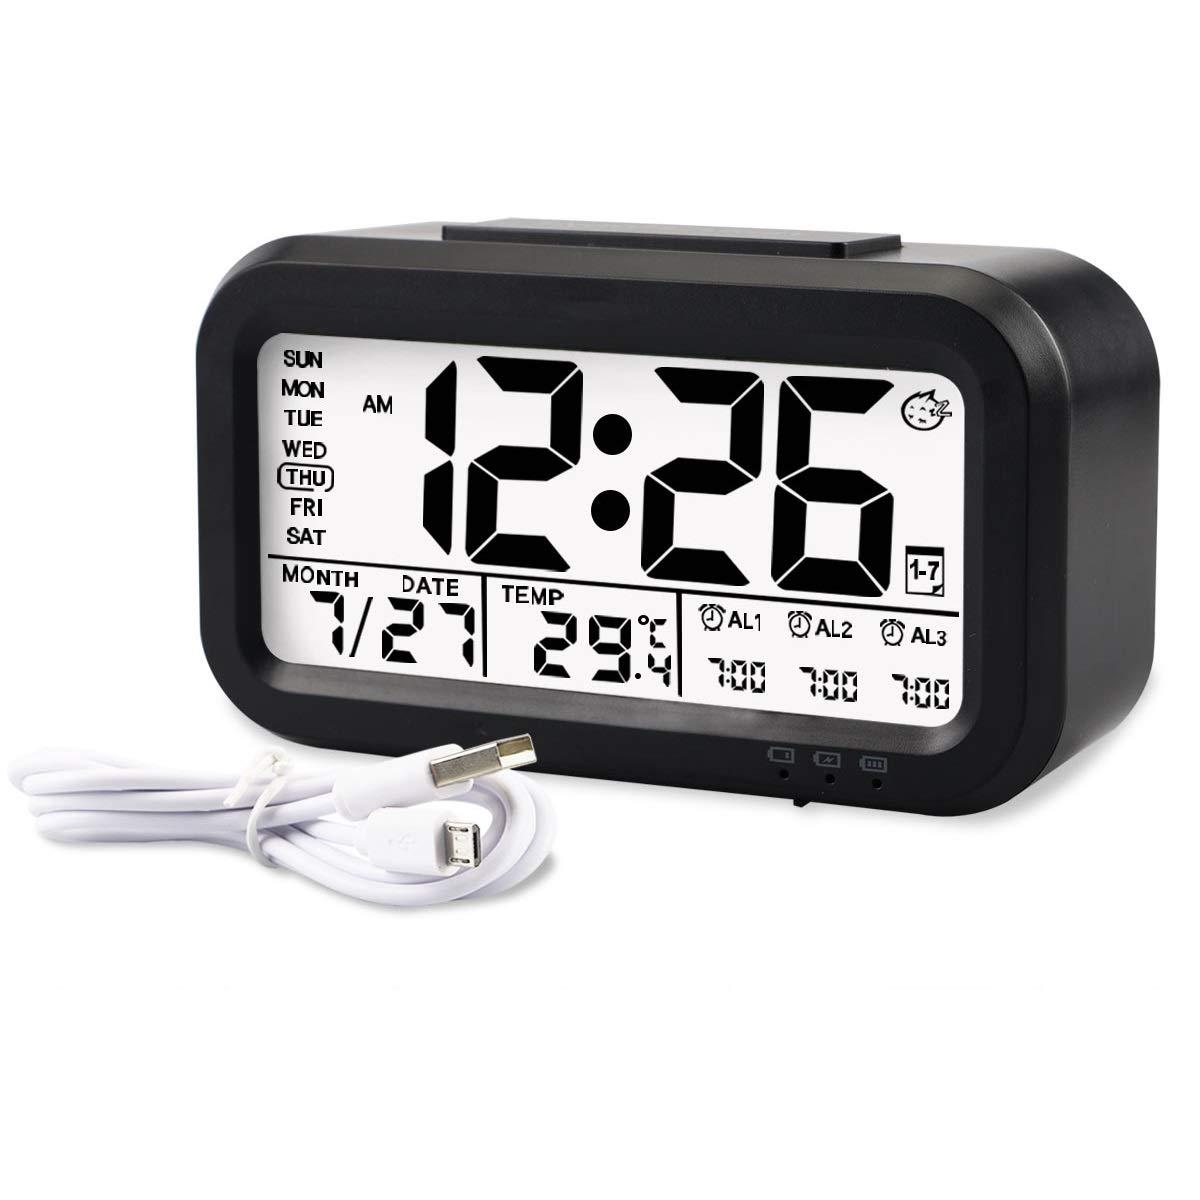 Aitey Alarm Clock, Digital Alarm Clock for Kids, Time/Date/Temperature Display, Snooze Function, 3 Alarms, Optional Weekday Mode, USB Charging (Black)